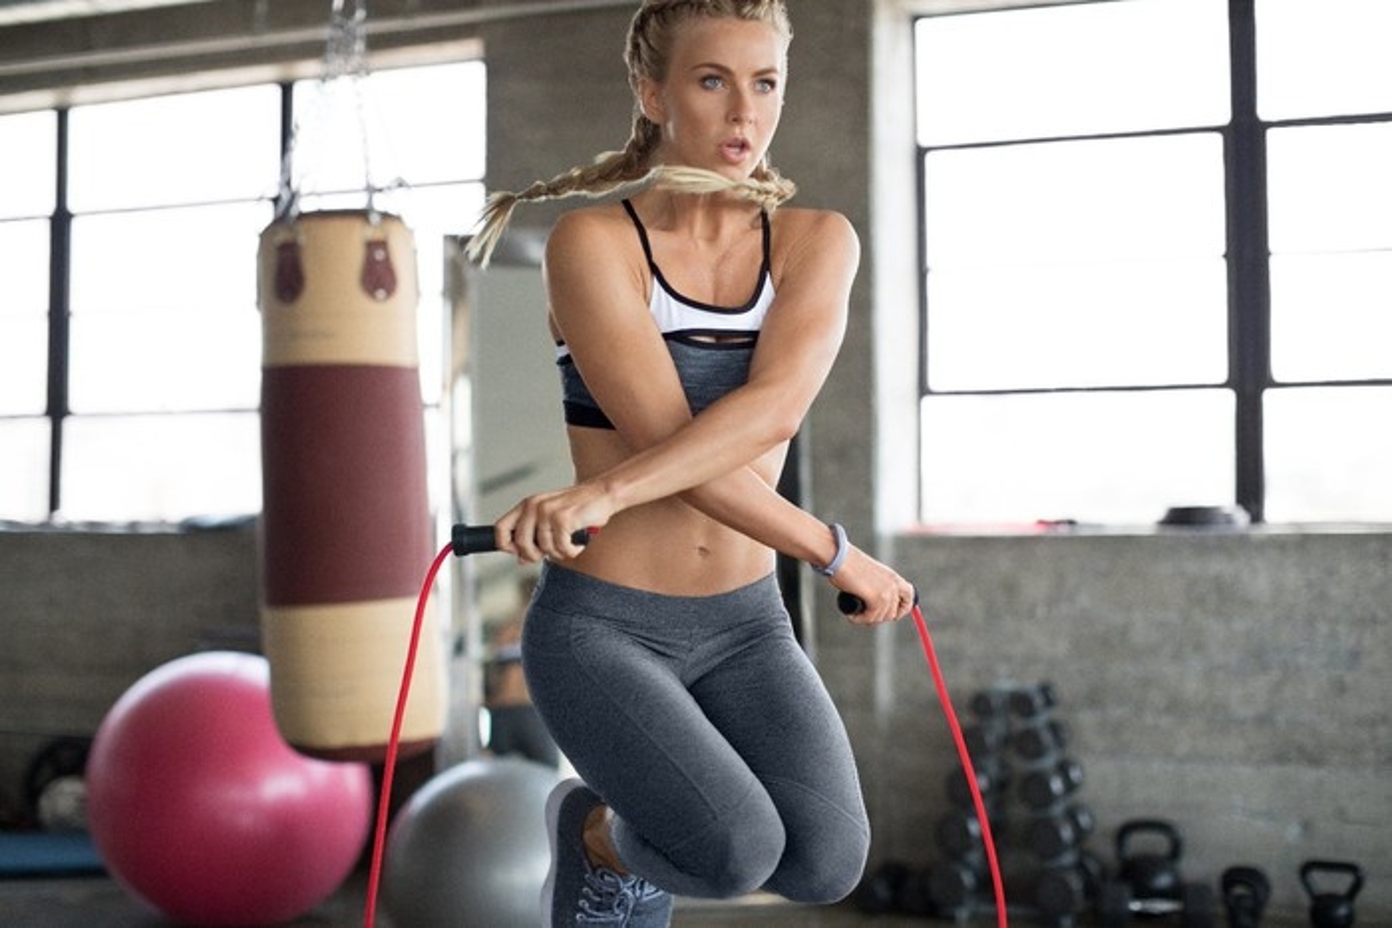 Fitbit spokeswoman Julianne Hough jumping rope wearing a Fitbit device.